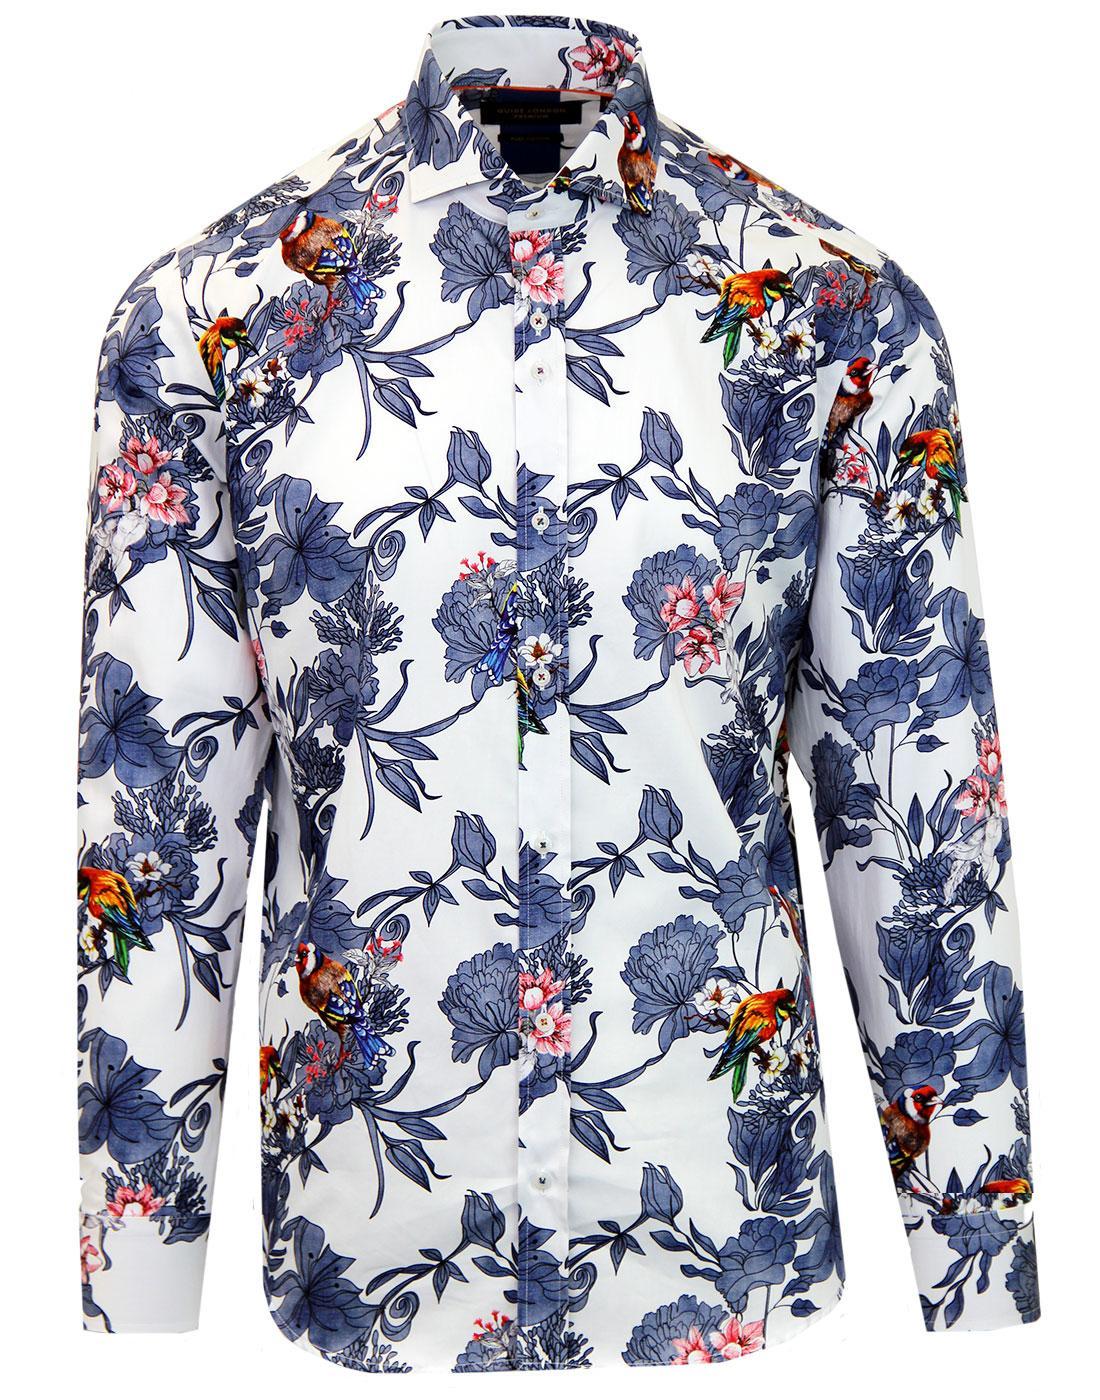 GUIDE LONDON Retro Mod Floral Bird Print Shirt